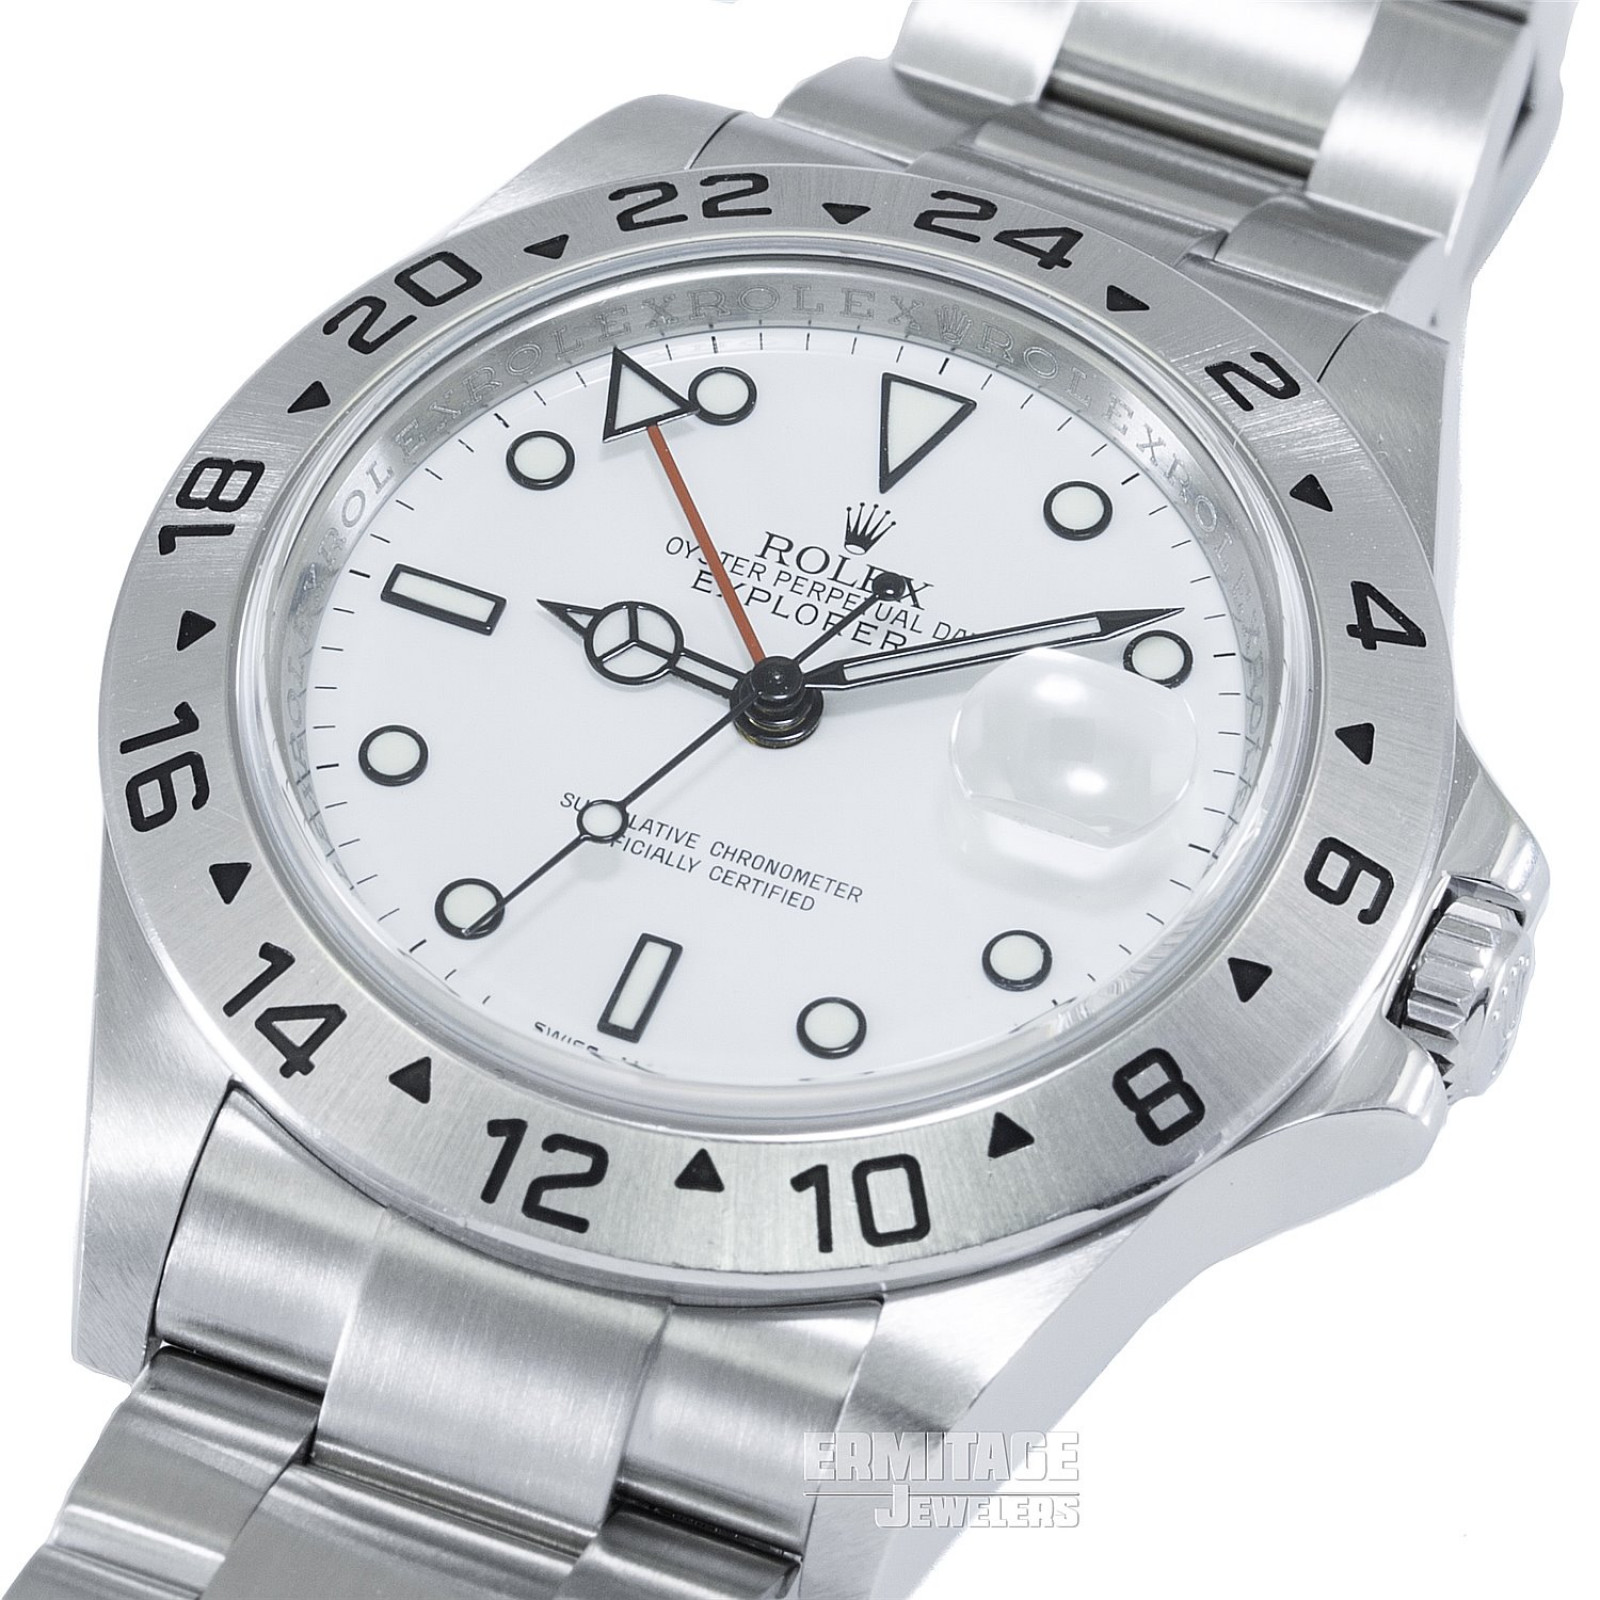 2009 Rolex Explorer II Ref. 16570  Polar Cal.3186